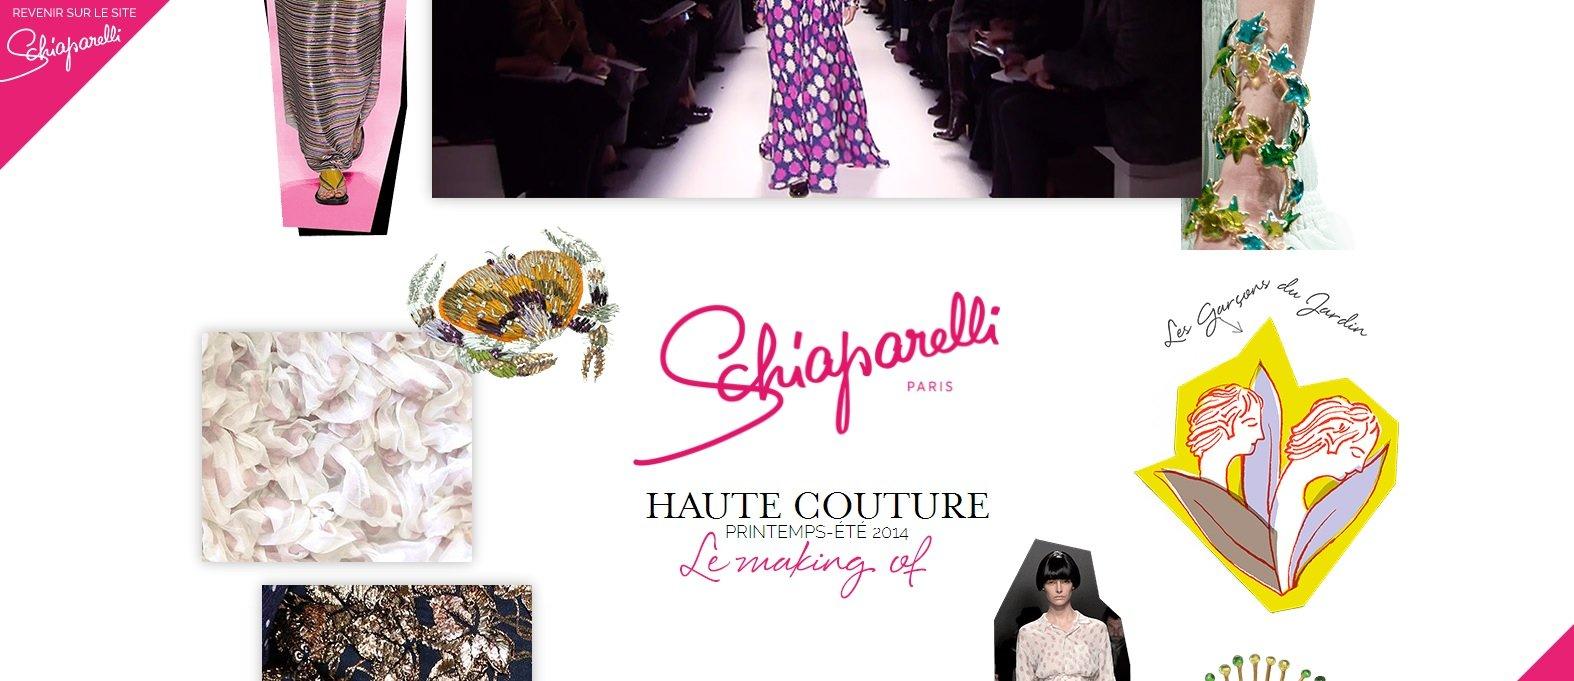 La nueva web de Schiaparelli, el universo del Haute Couture